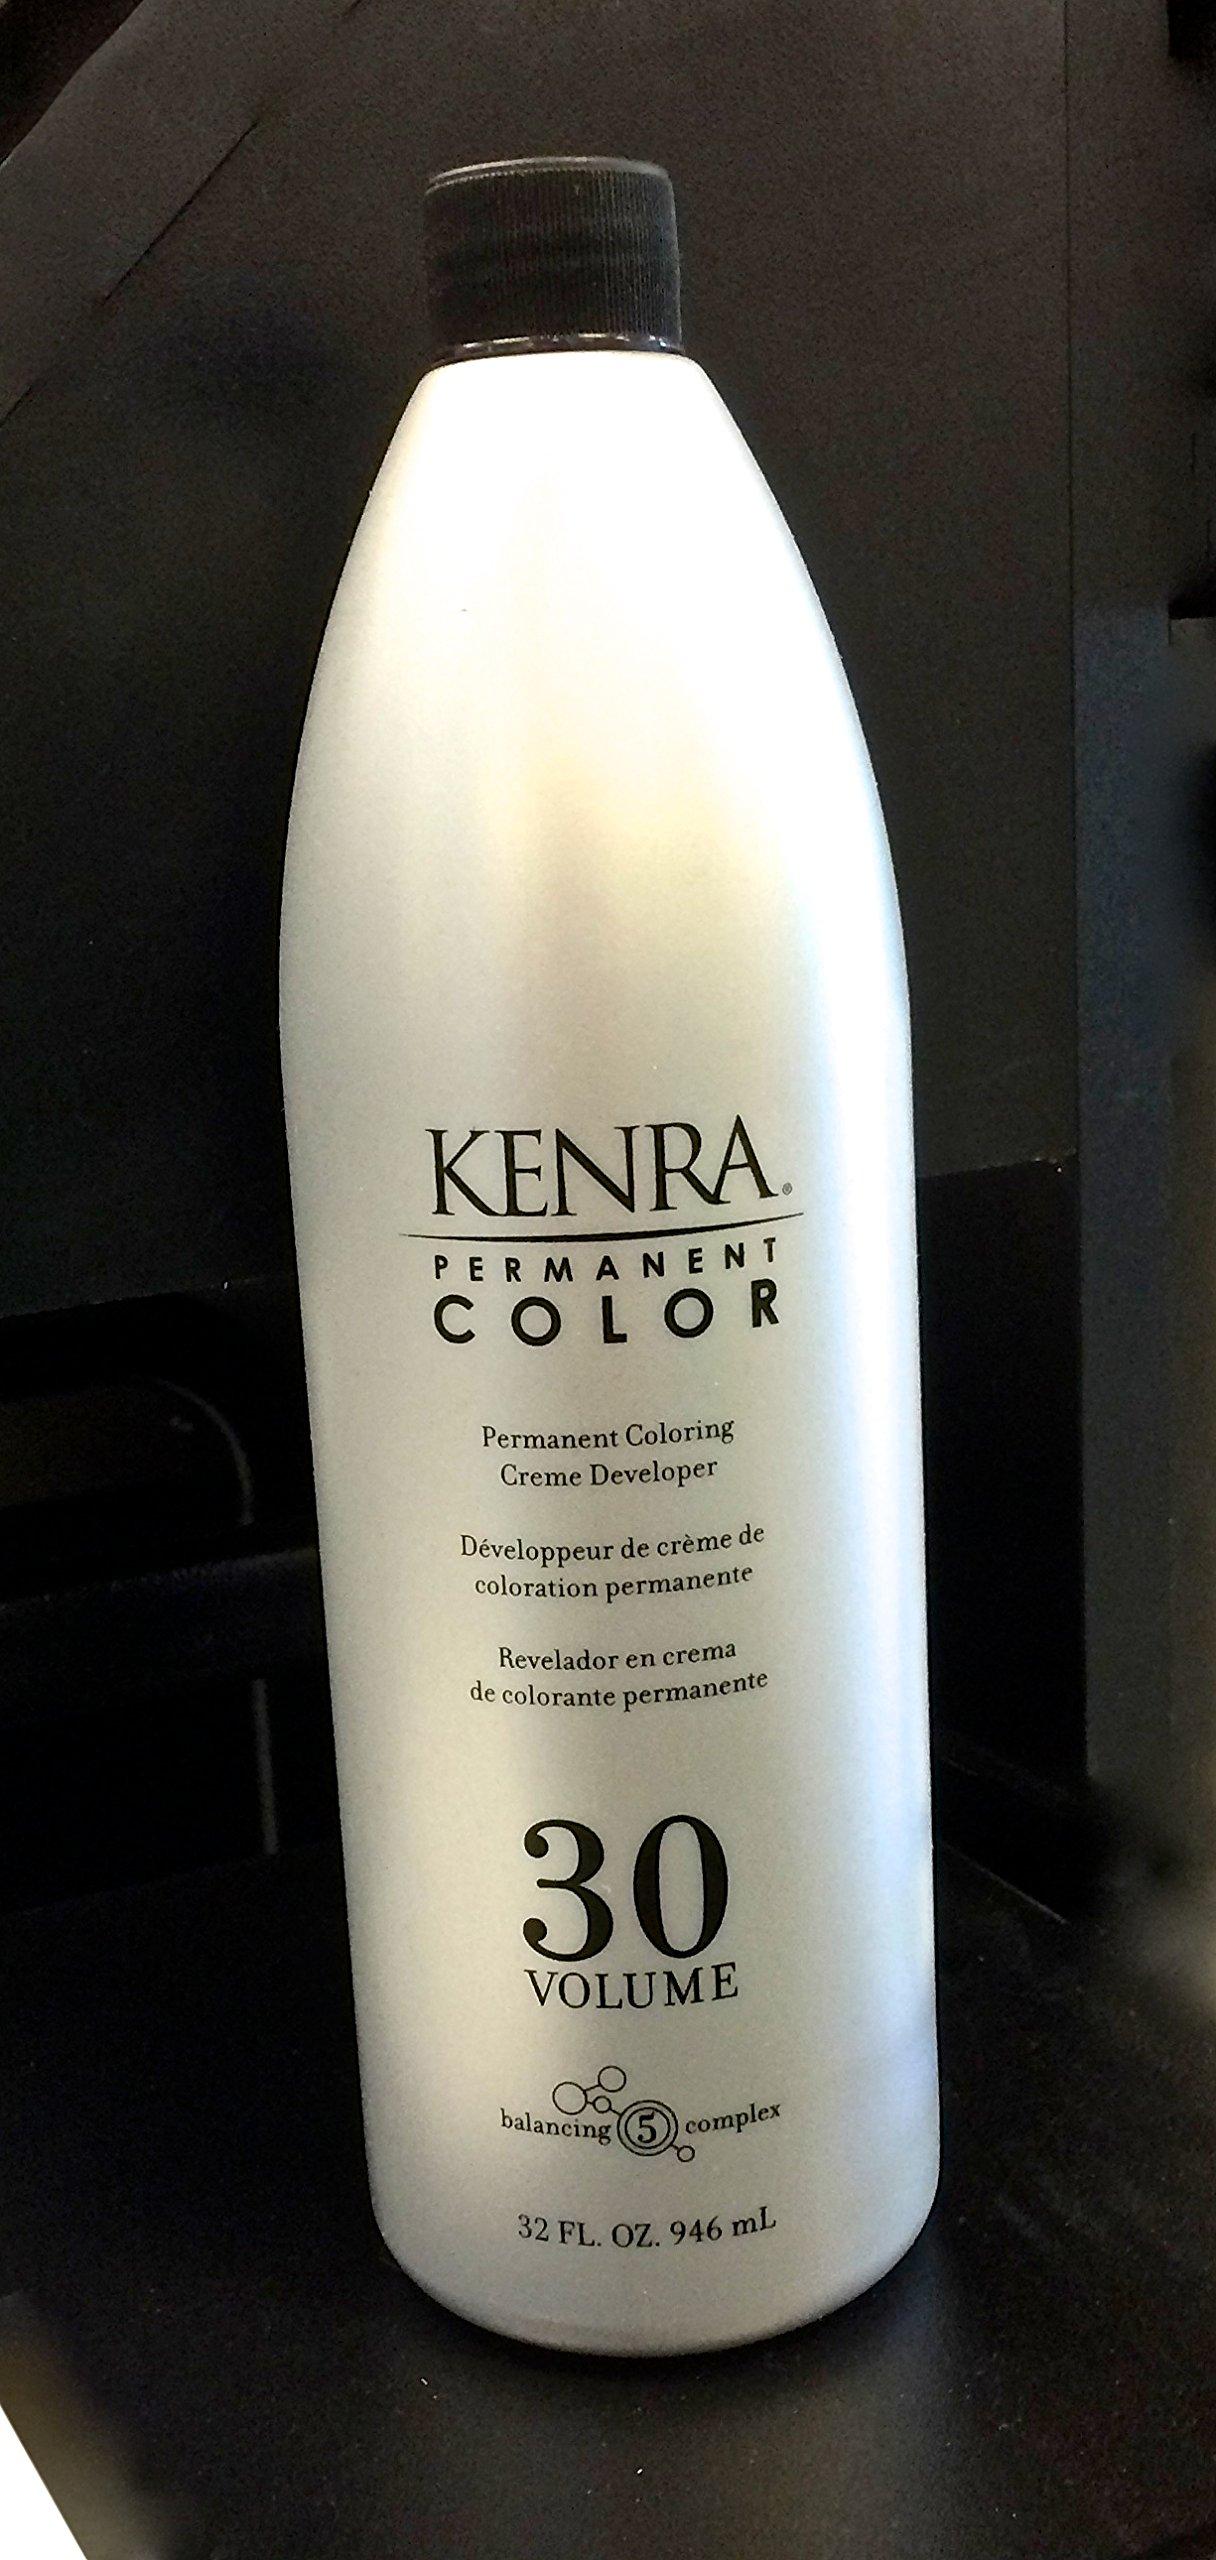 Kenra Permanent Color Creme Developer 30 Volume, 32 Fluid Ounce